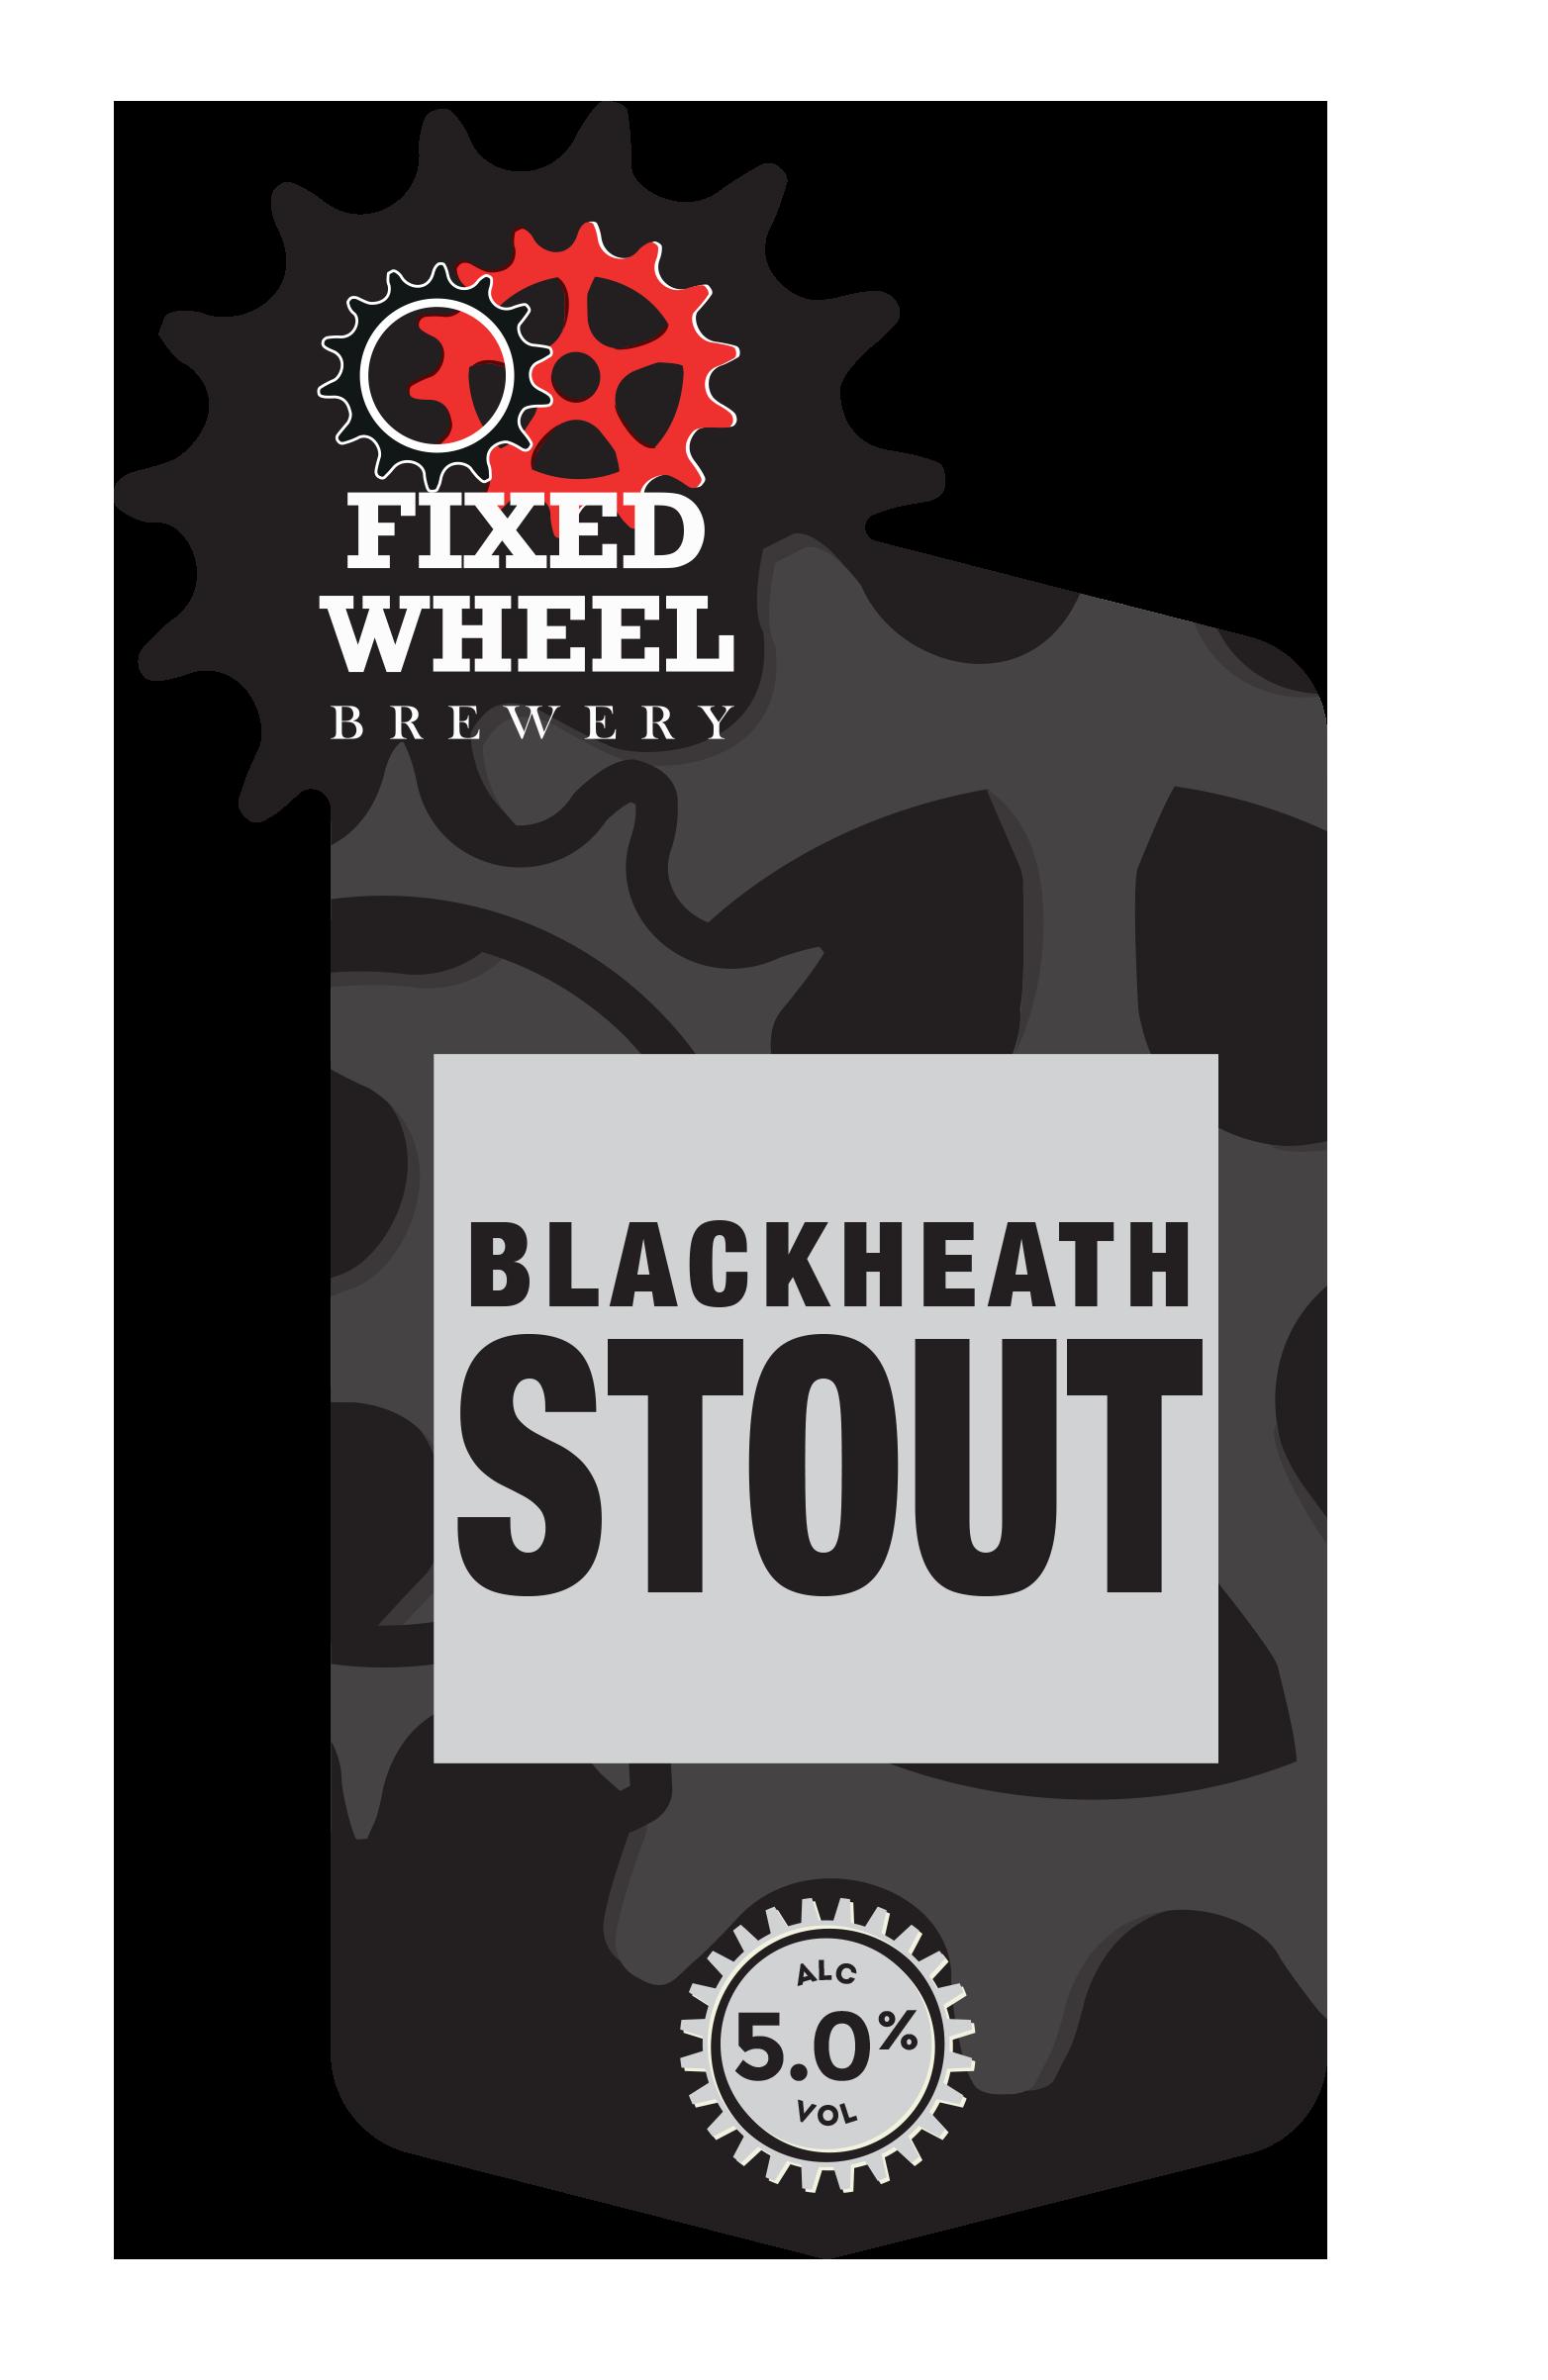 Fixed Wheel Blackheath Stout 9 Gallons Dark 5.0%